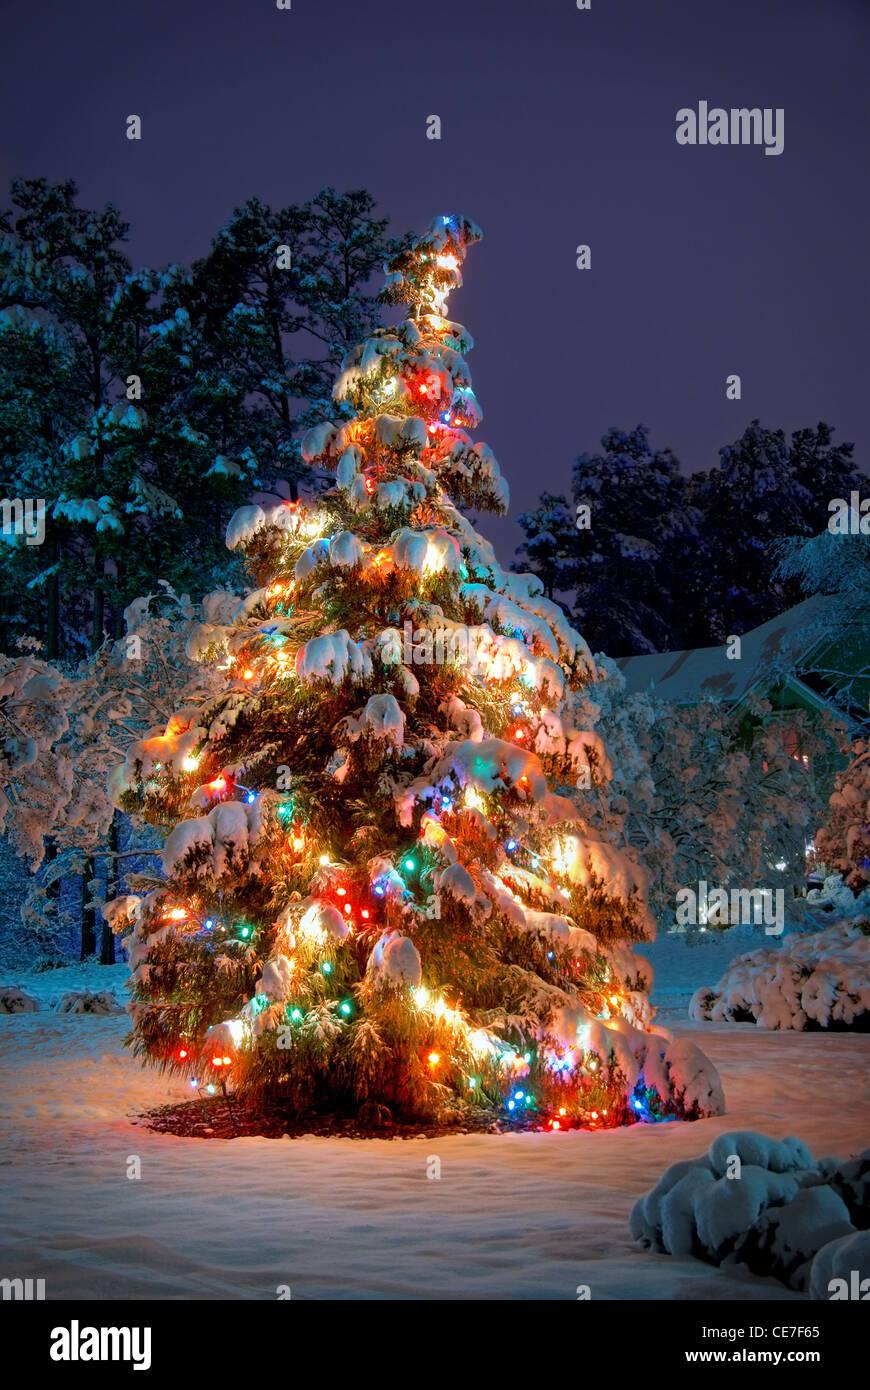 christmas snow trees night lights stock photos christmas. Black Bedroom Furniture Sets. Home Design Ideas